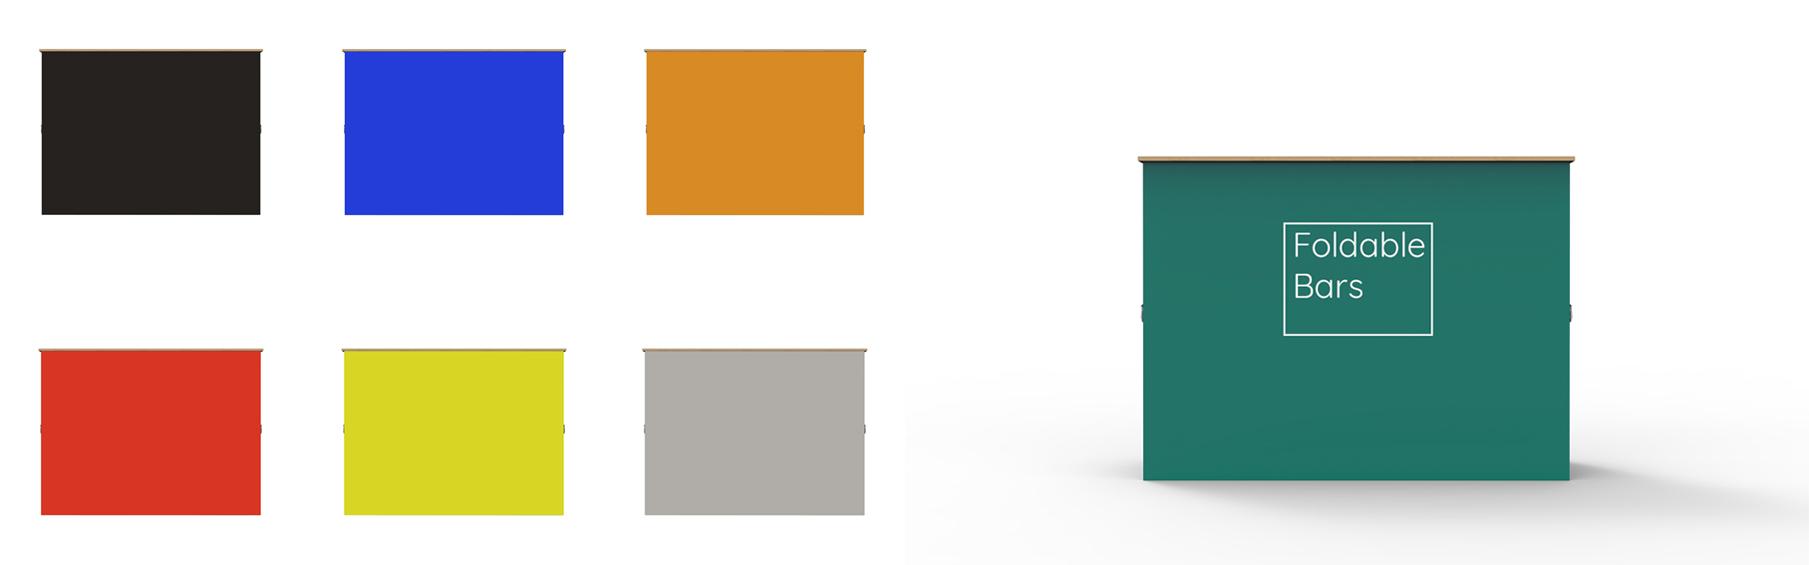 Bar logo and colour image.jpg